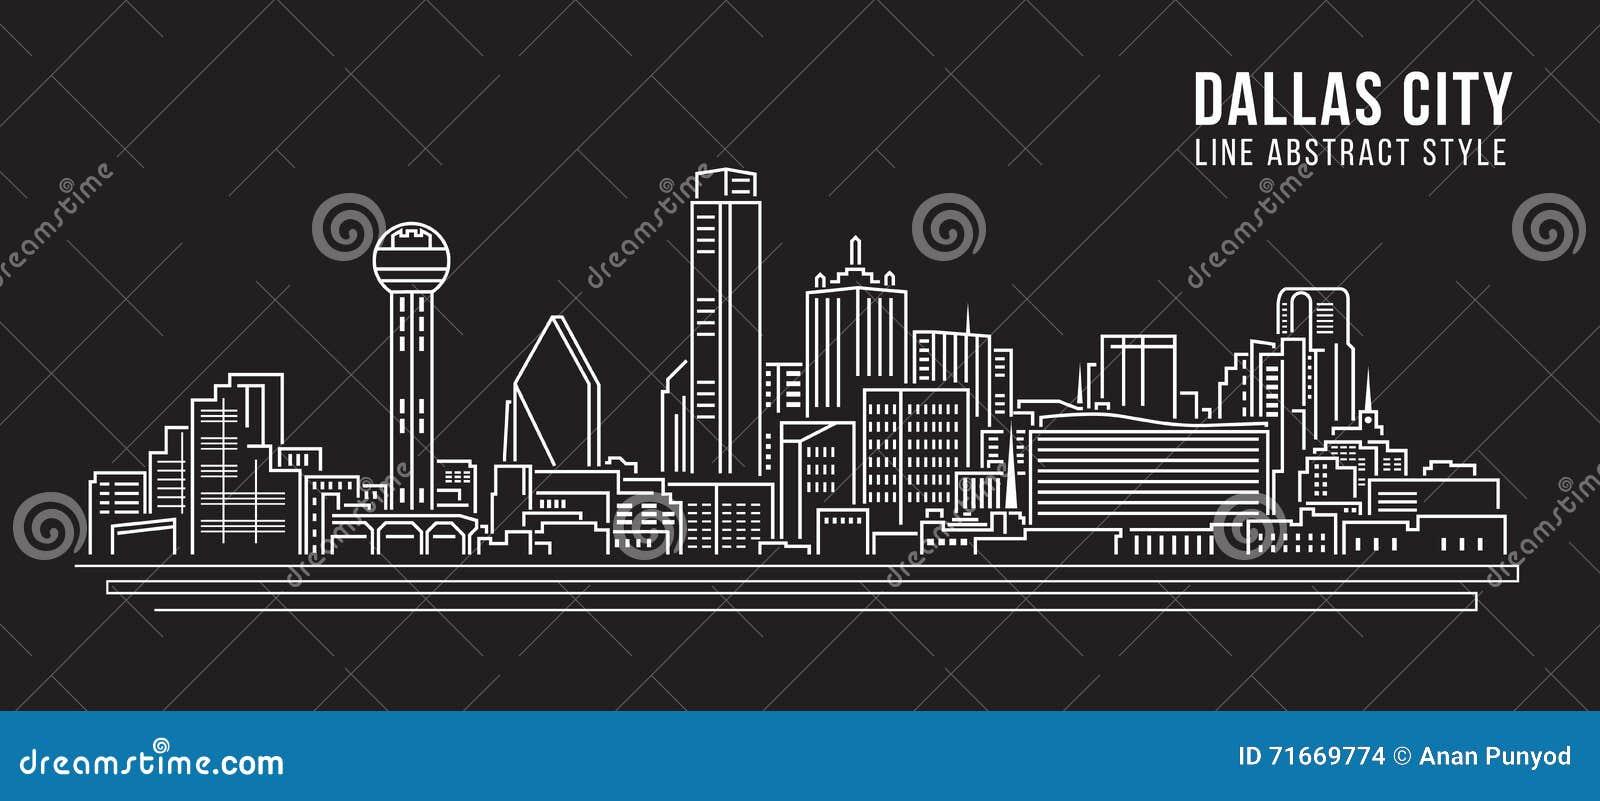 Line Art City : Cityscape building line art vector illustration design dallas